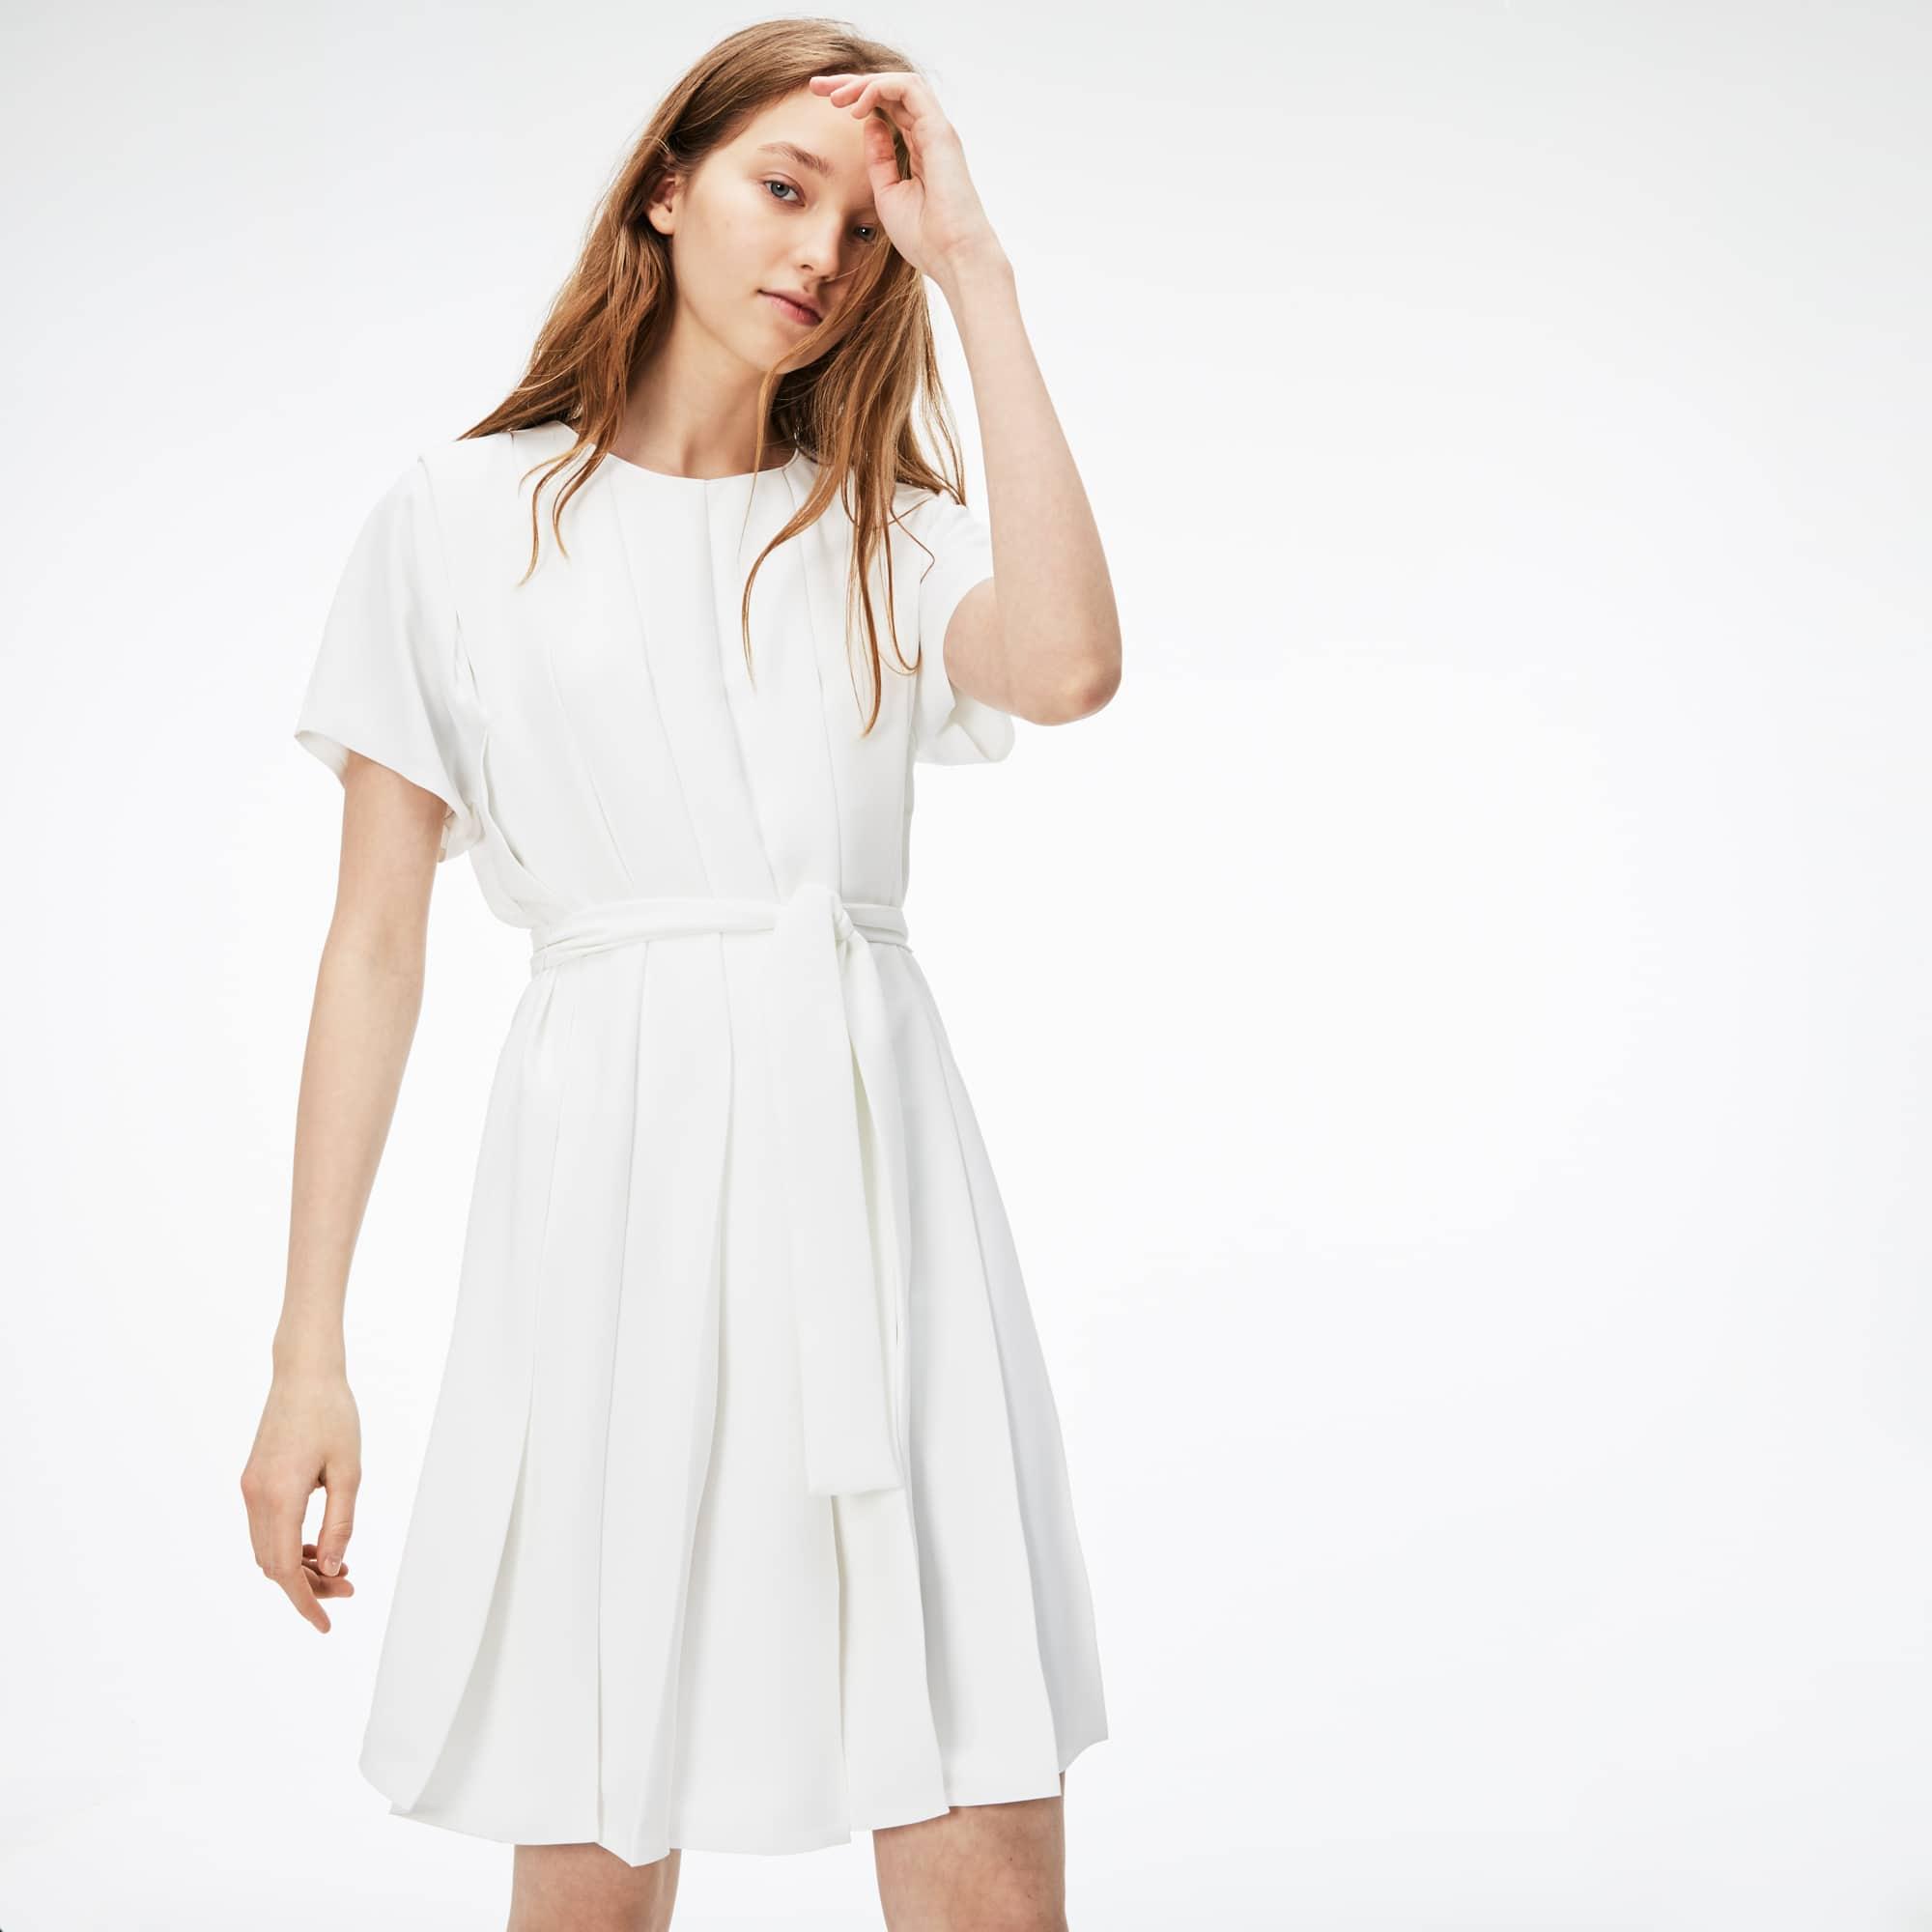 Women's Pleated Crepe Dress